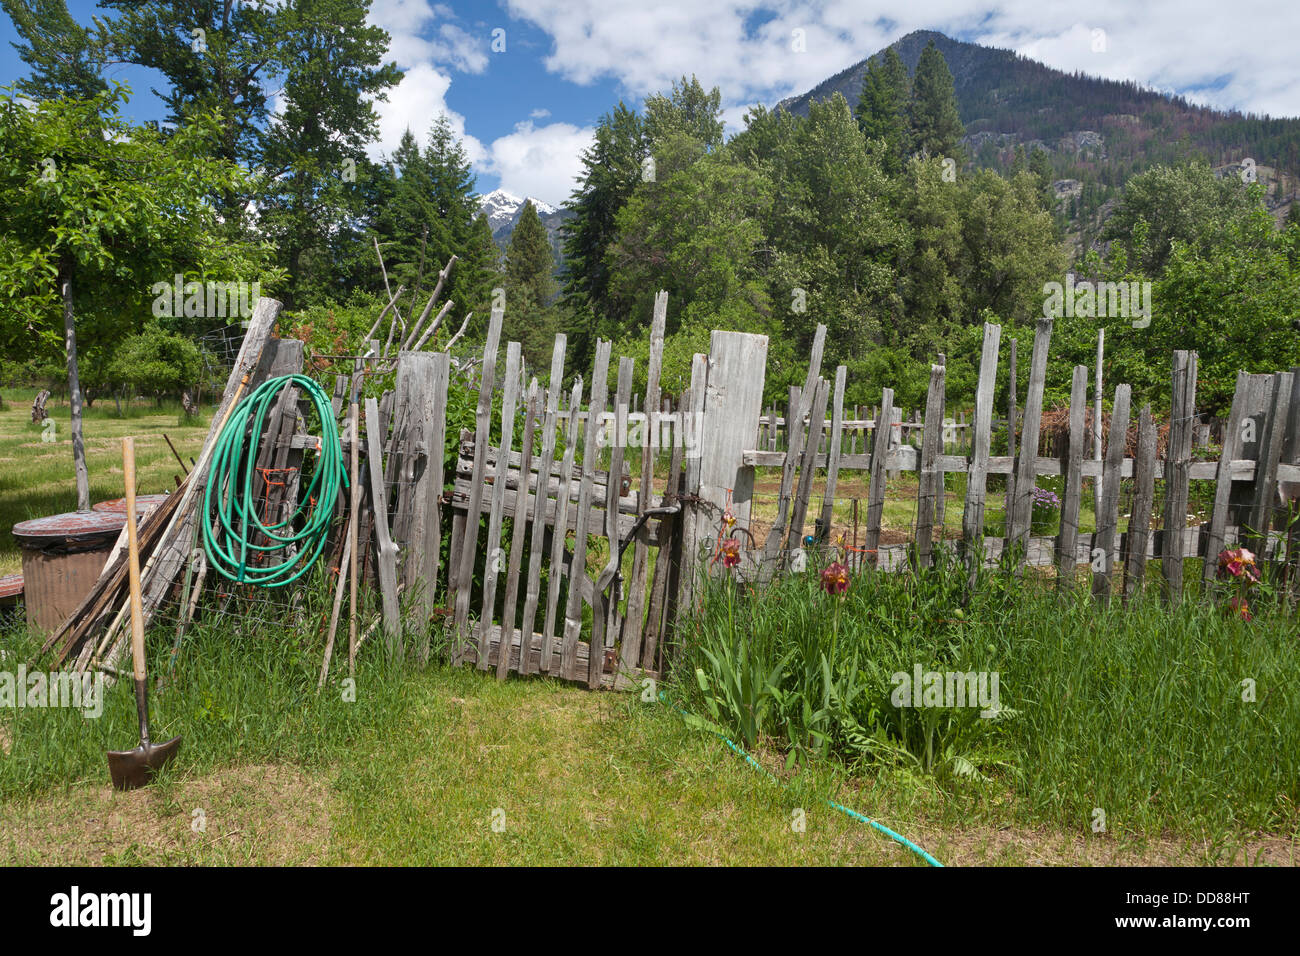 USA, Washington, Stehekin. Organic garden on Buckner Orchard and Homestead. - Stock Image